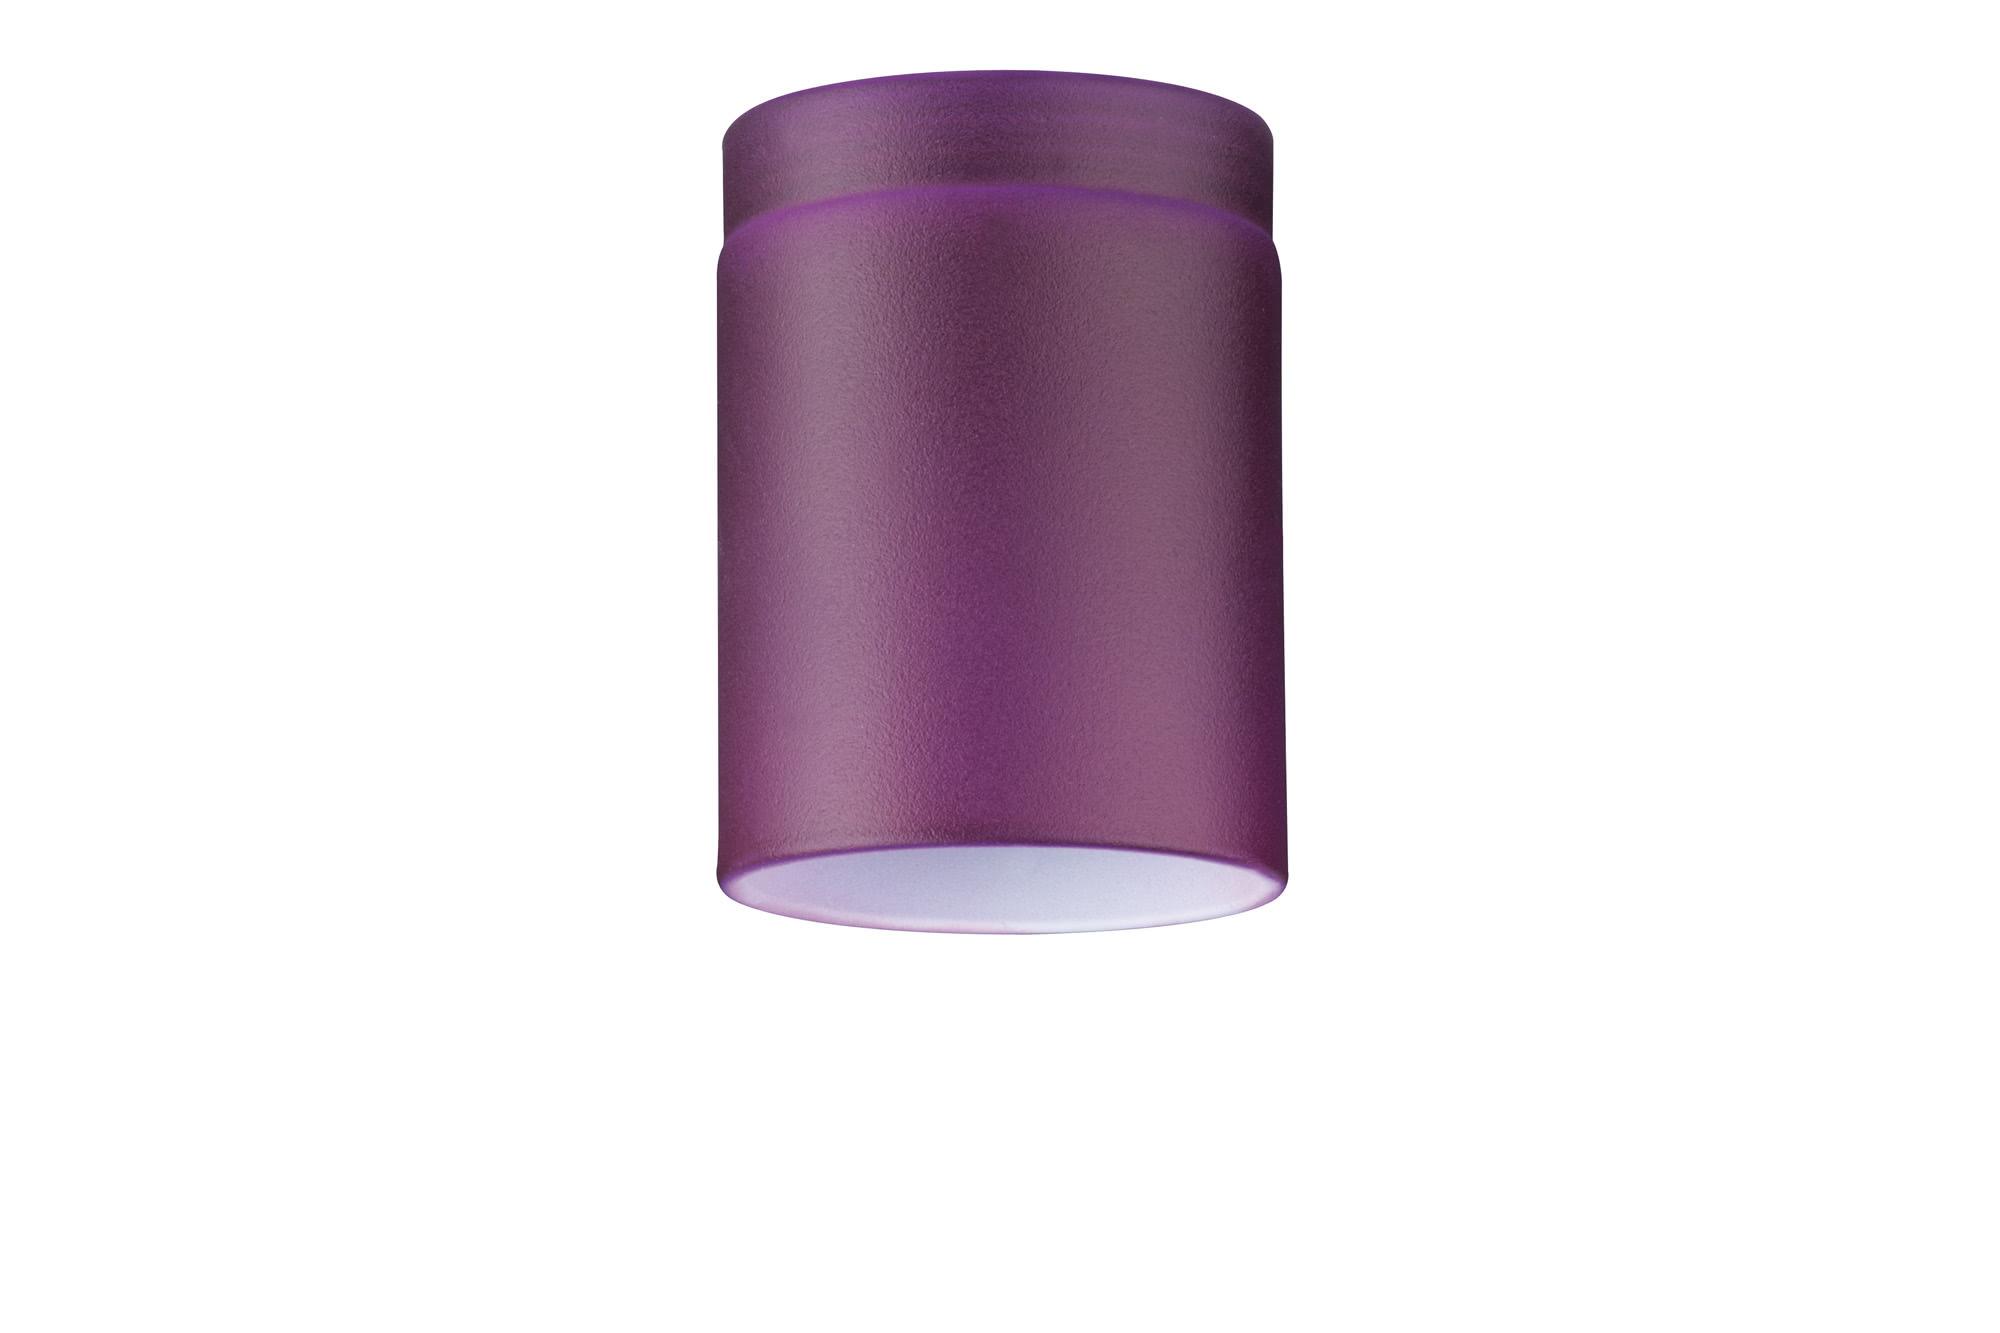 Paulmann. 92578 Плафон для DecoSystems Tube Mini, lilac, стекло